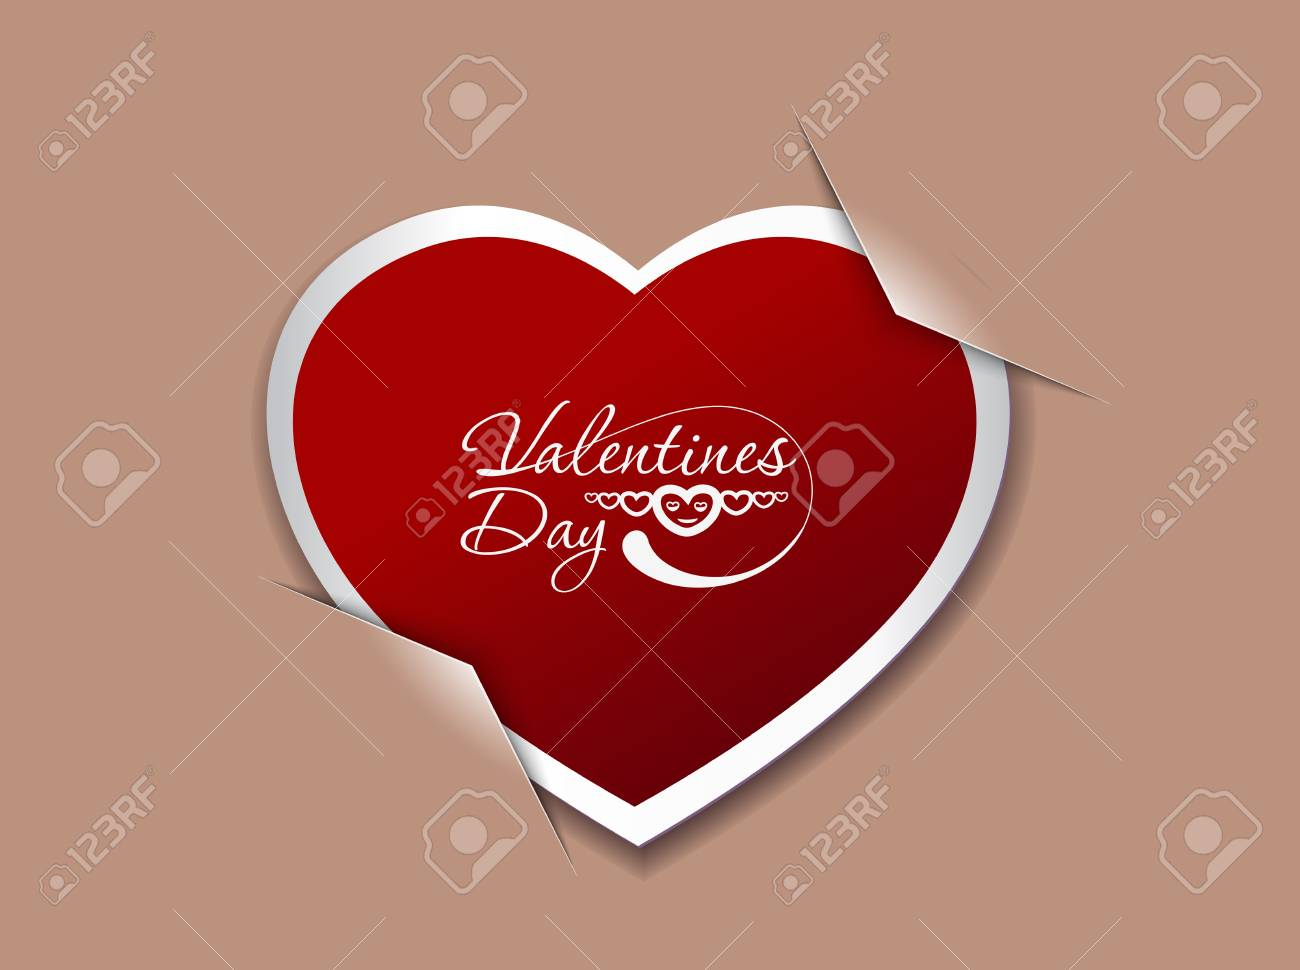 valentine's day background, vector illustration. Stock Vector - 12125585